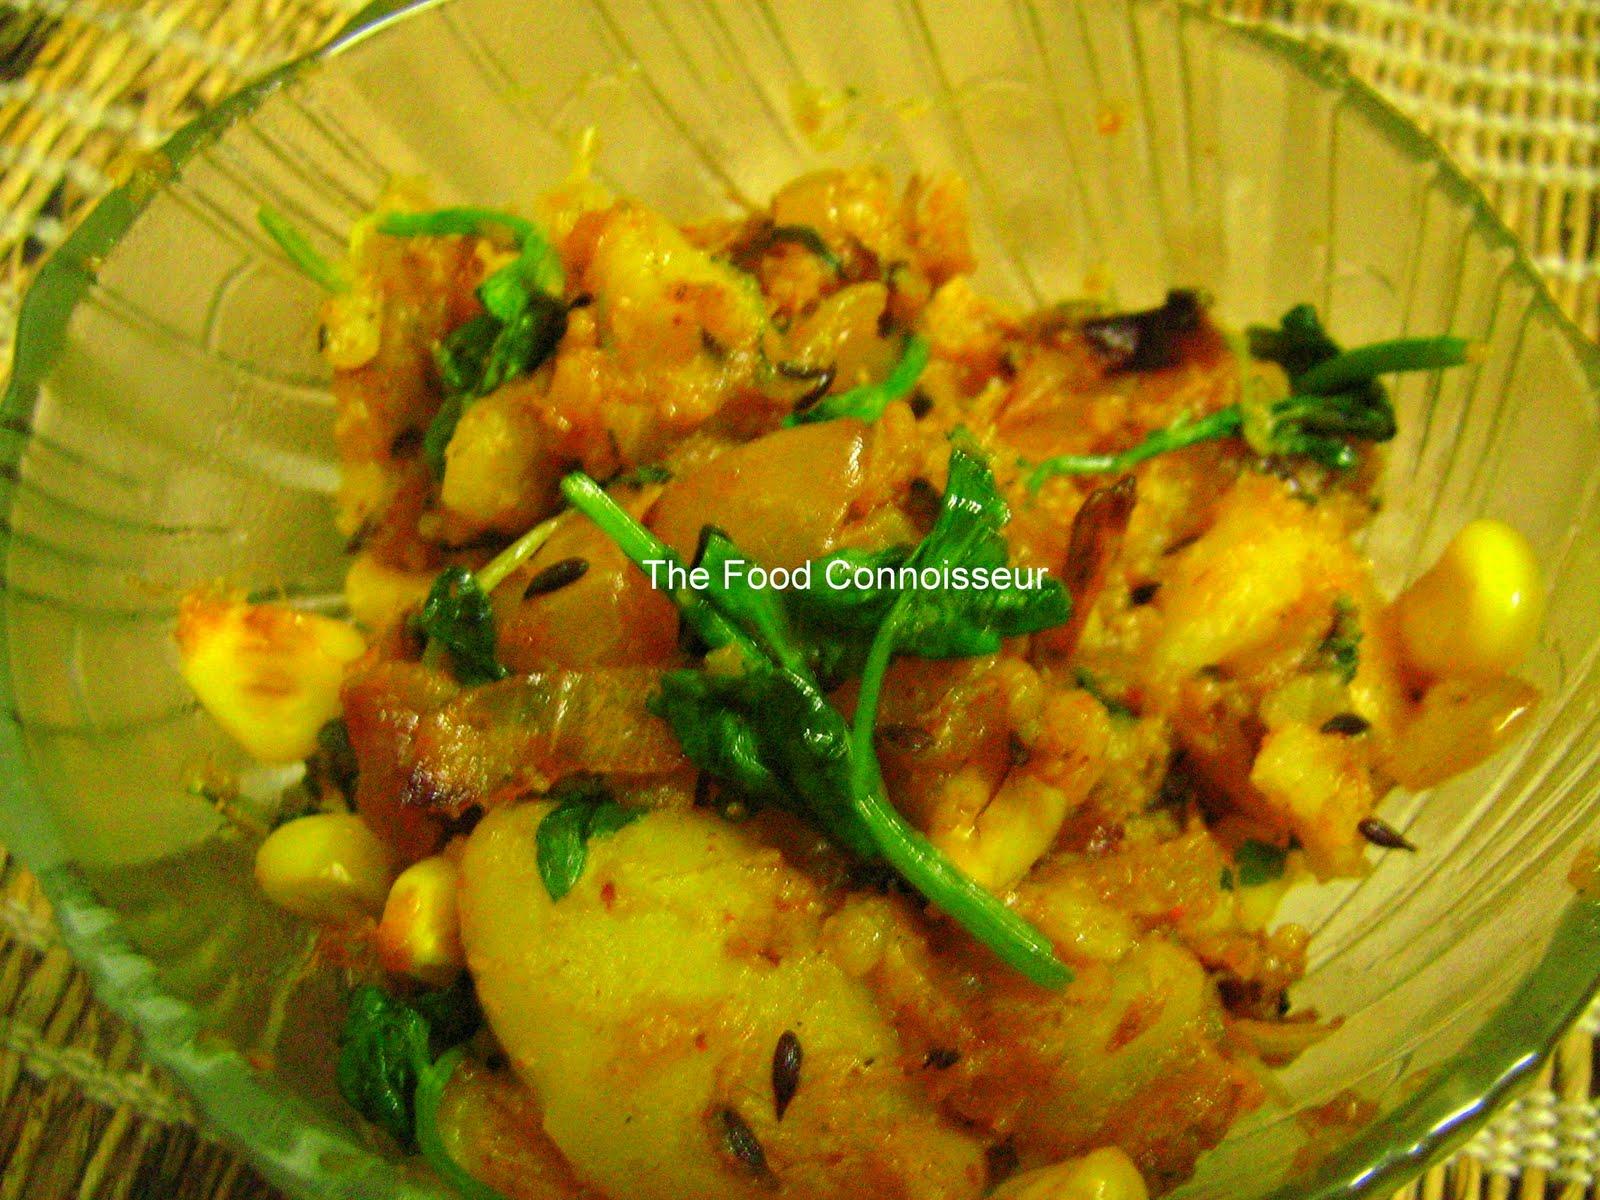 The Food Connoisseur: Aloo Methi (Potatoes with Fenugreek Leaves)